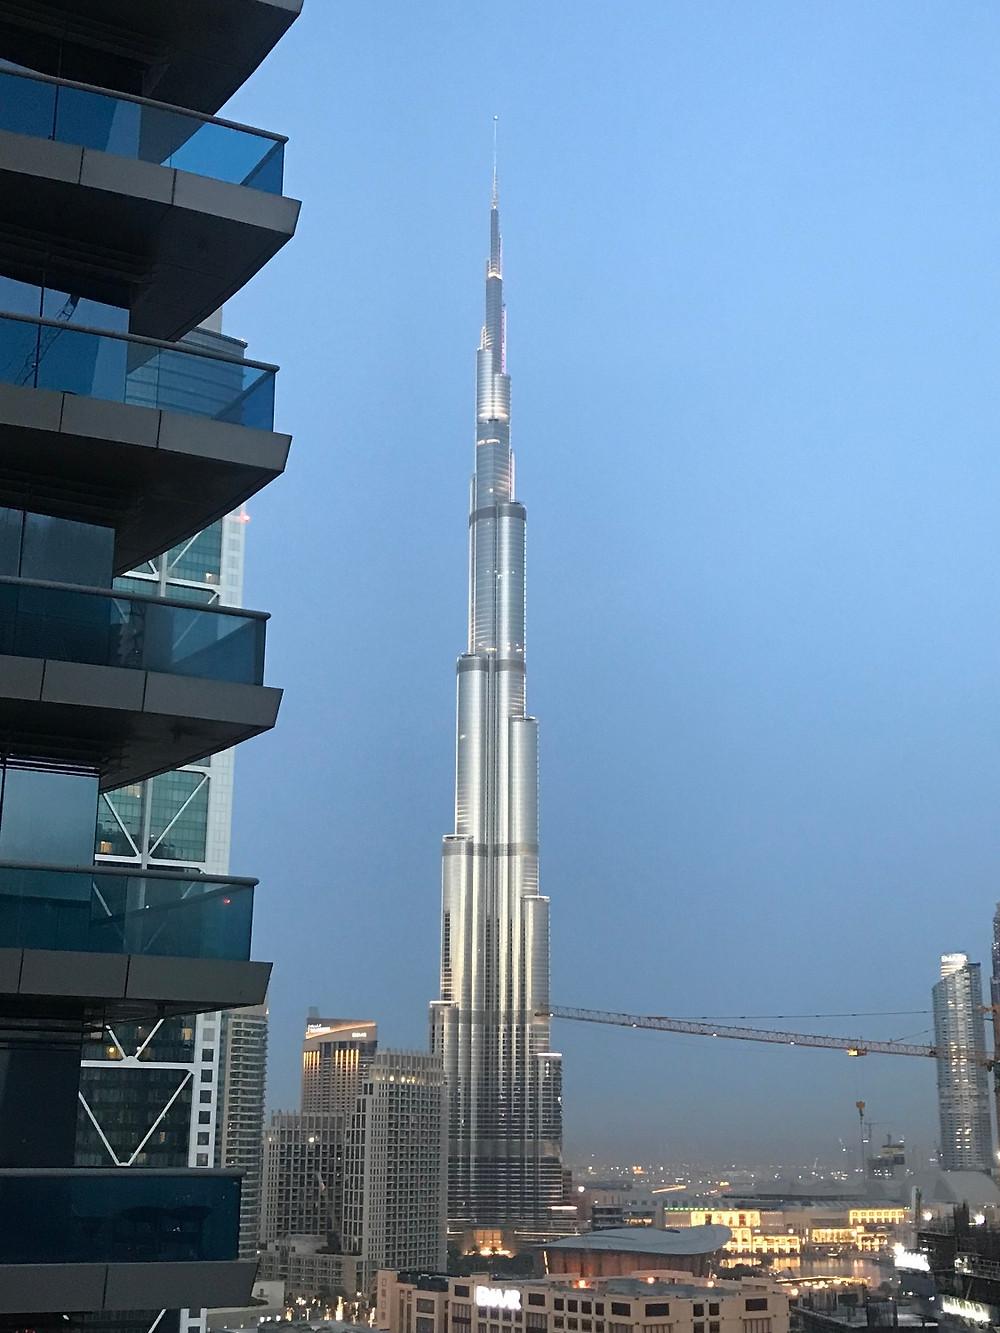 Balcony view of the Burj Khalifa, right before sundown